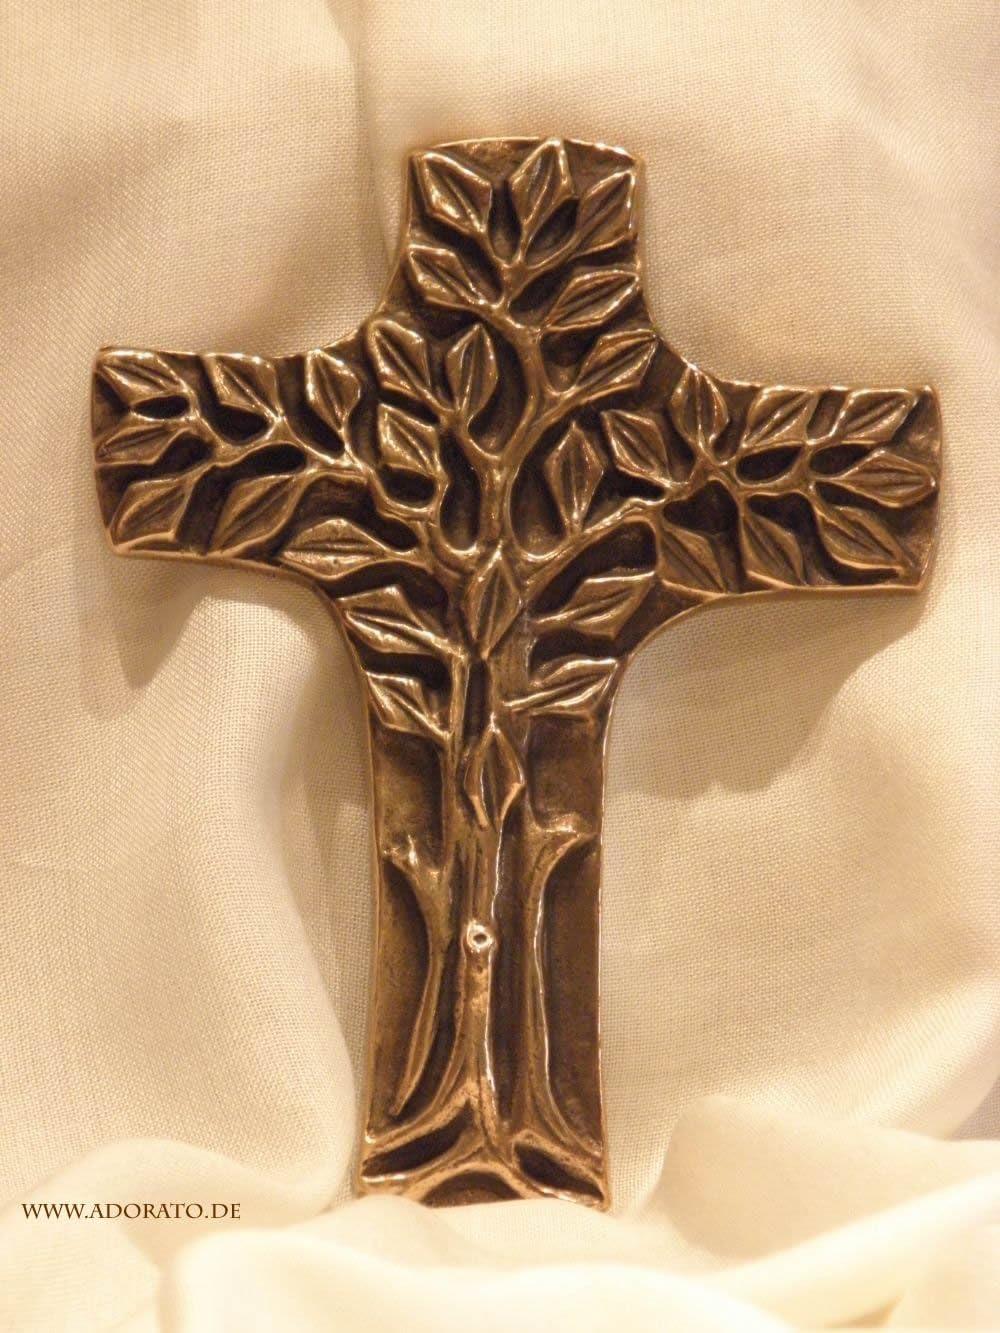 Butzon /& Bercker Bronzekreuz Wandkreuz 16 cm Bronze stilvoll Kruzifix Schmuckkreuz